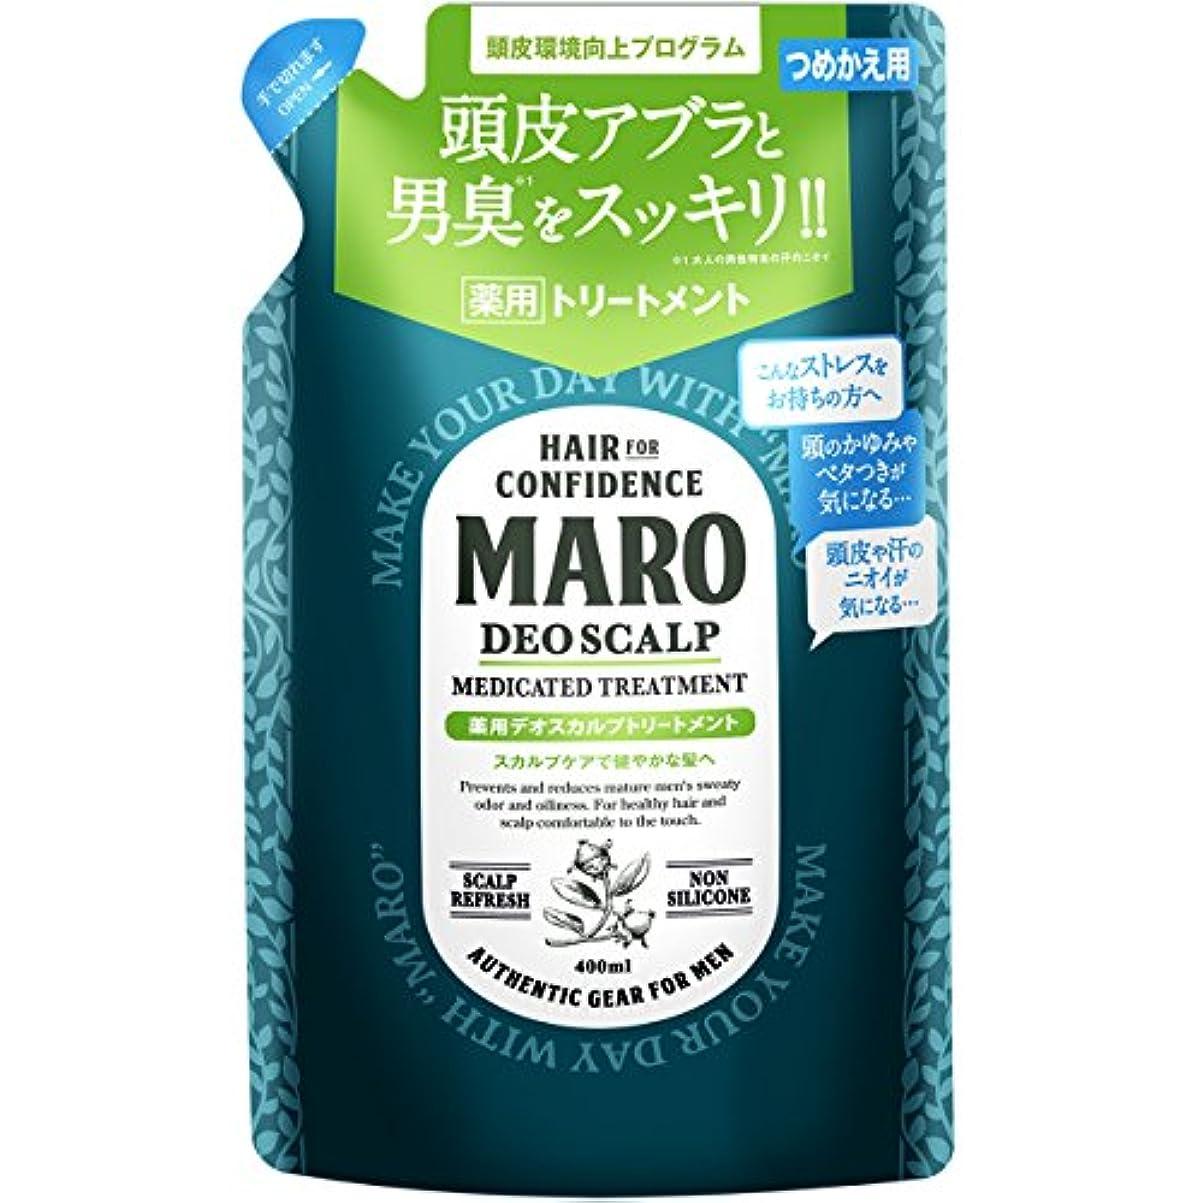 MARO 薬用 デオスカルプ トリートメント 詰め替え 400ml 【医薬部外品】